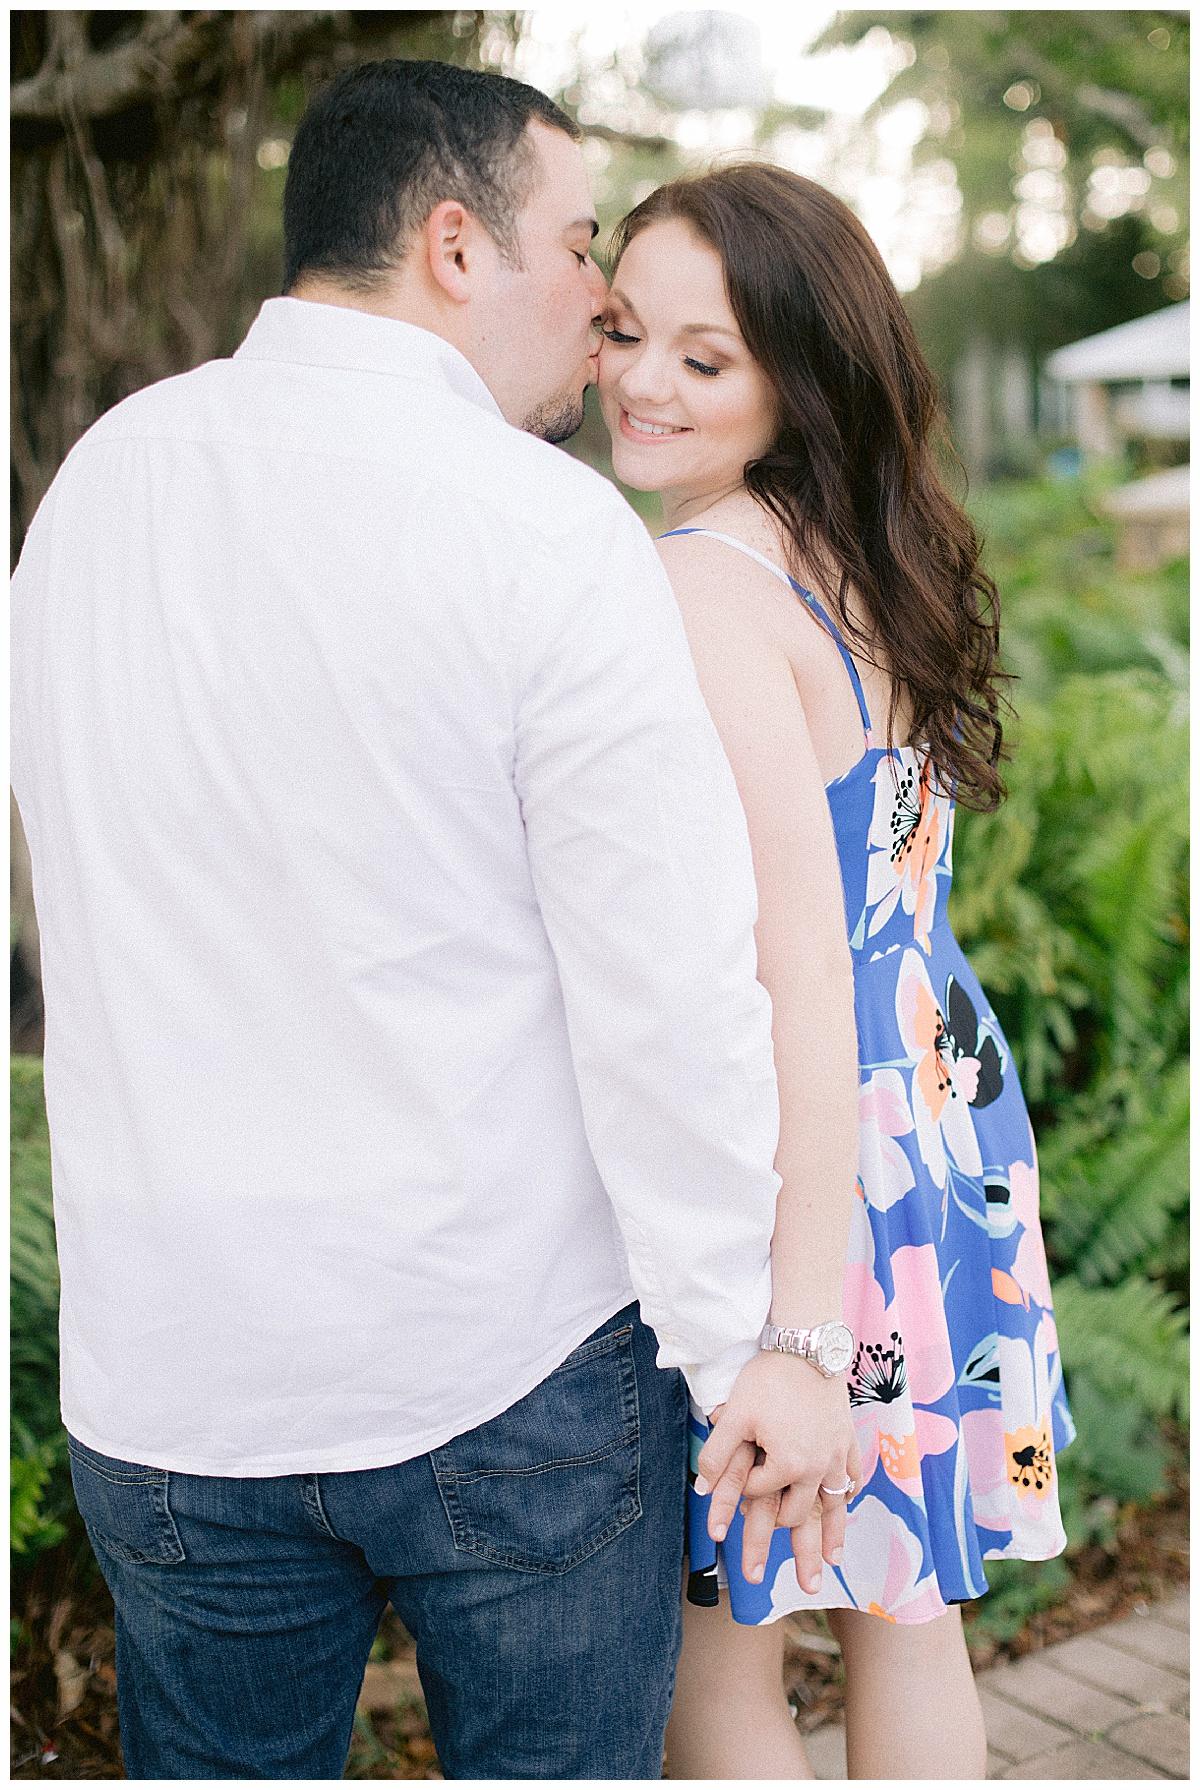 Kissing his fiance on the cheek | Stuart Fl